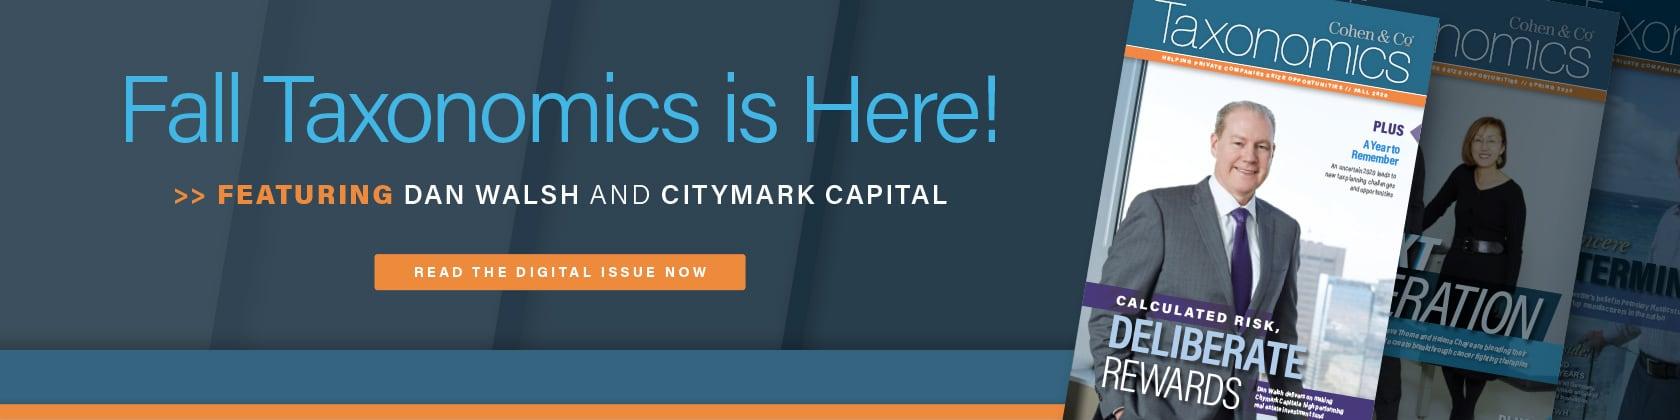 Featuring Dan Walsh and Citymark Capital